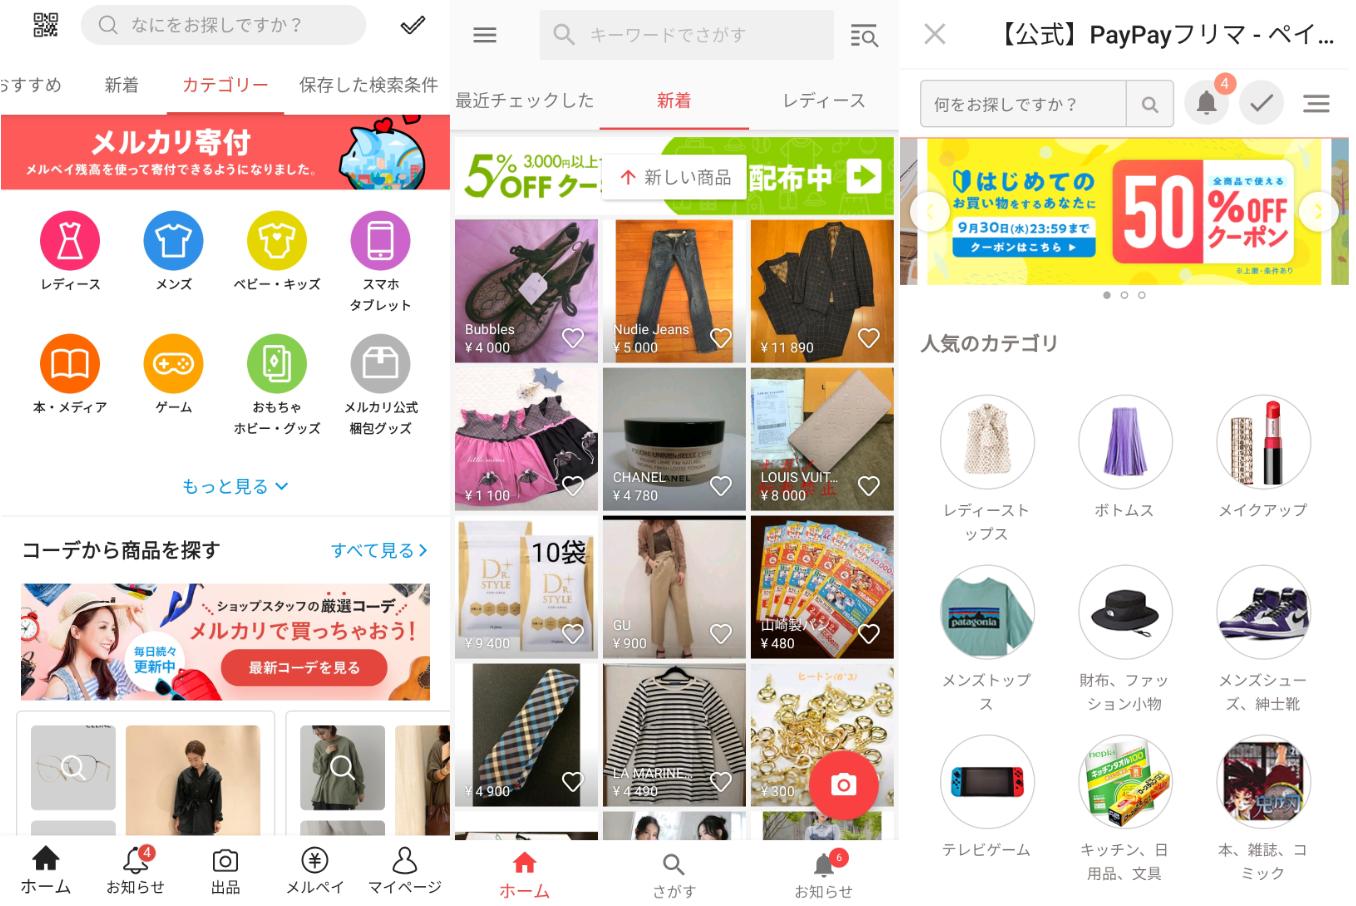 Kanji Cheat Sheet: Buying and Selling on Mercari, Rakuma, and PayPay Furima